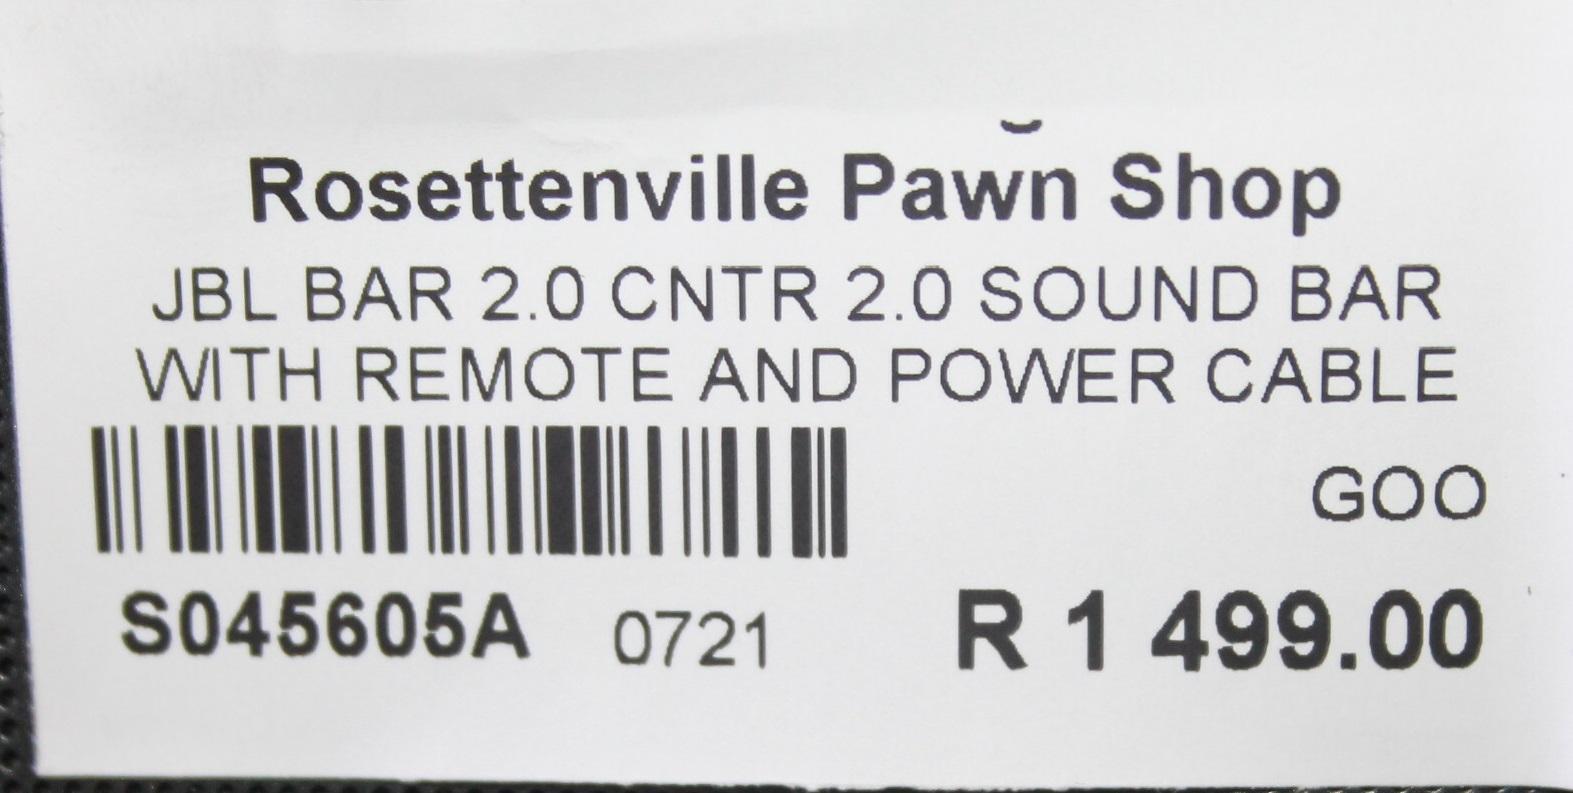 JBL BAR 2.0 SOUND BAR WITH REMOTE S045605A #Rosettenvillepawnshop